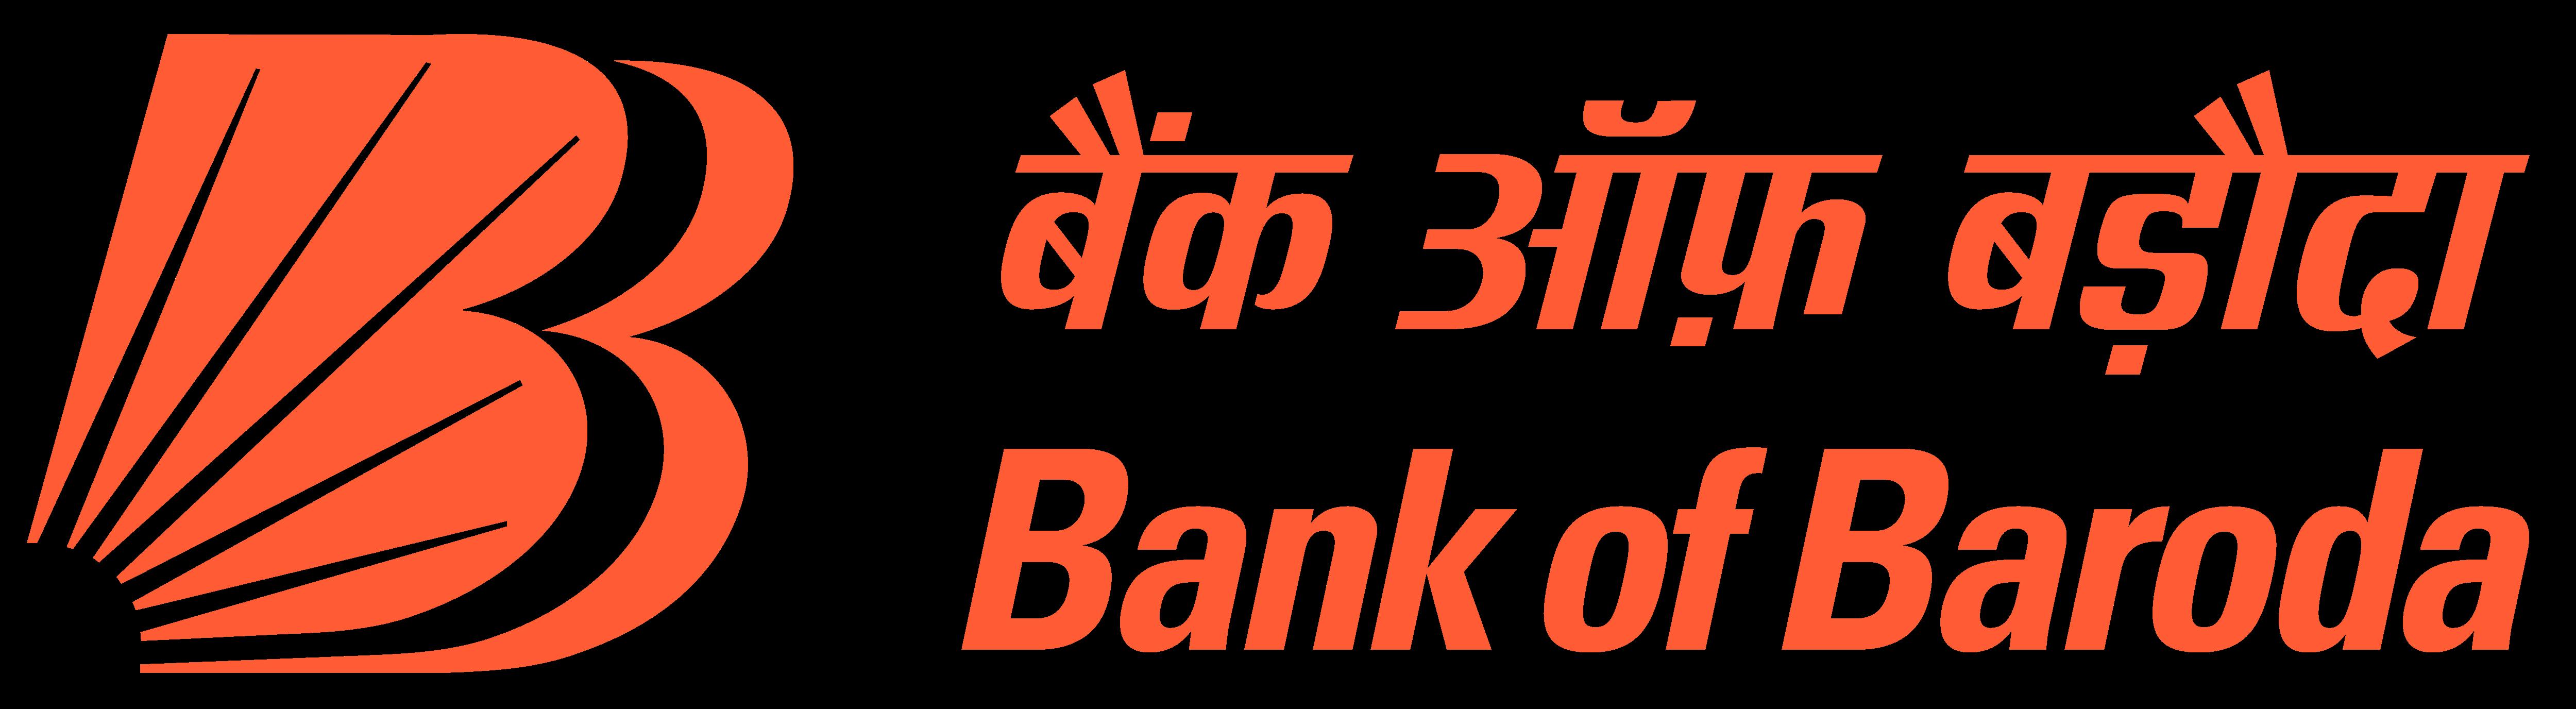 bank of baroda � logos download